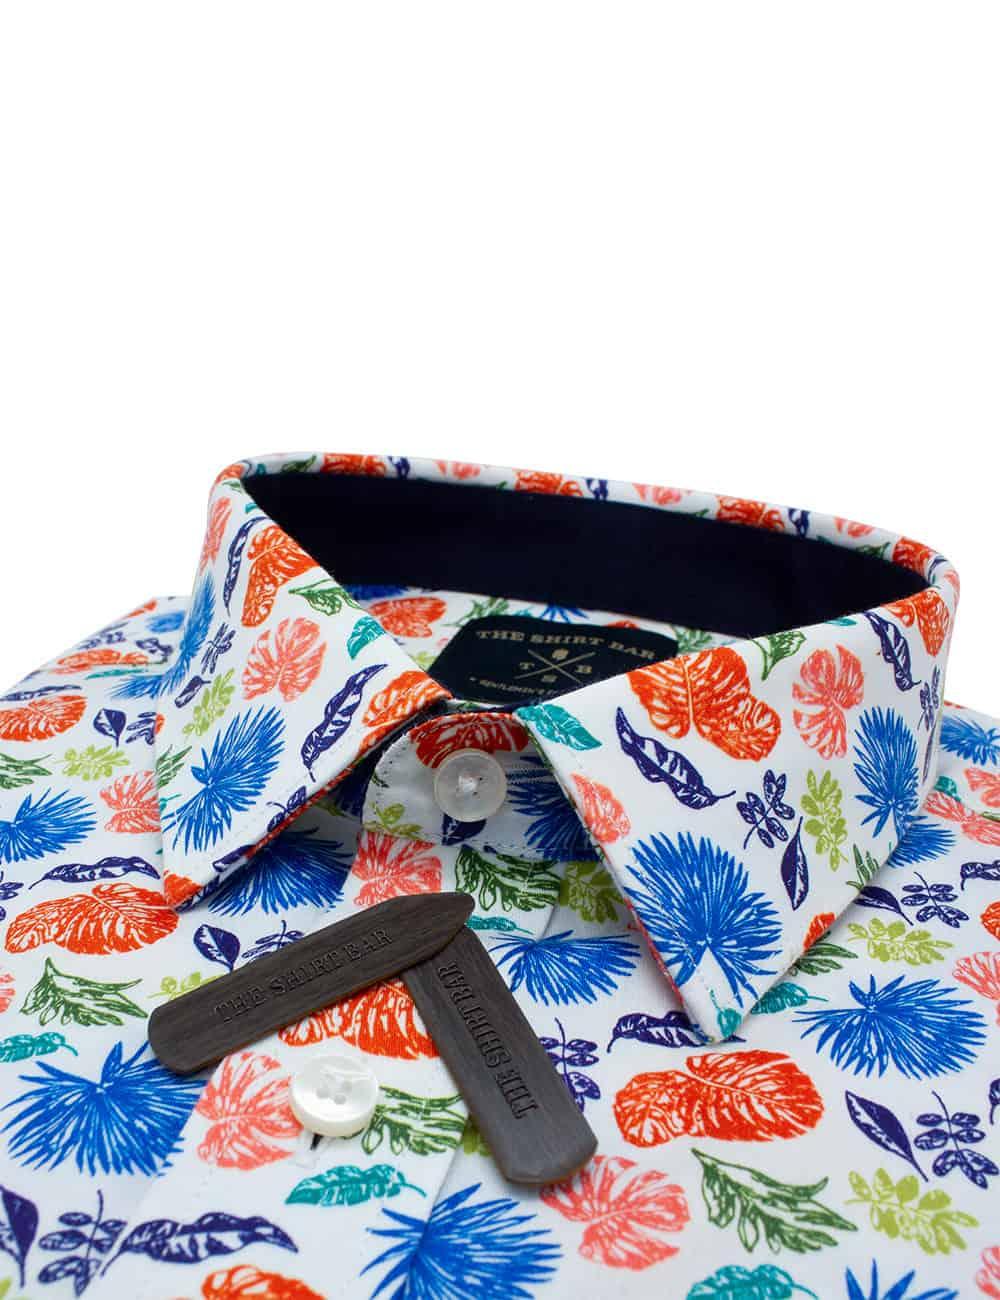 RF Orange Floral 00% Premium Cotton Sateen Digitally Printed Short Sleeve Shirt RF9SNB11.12